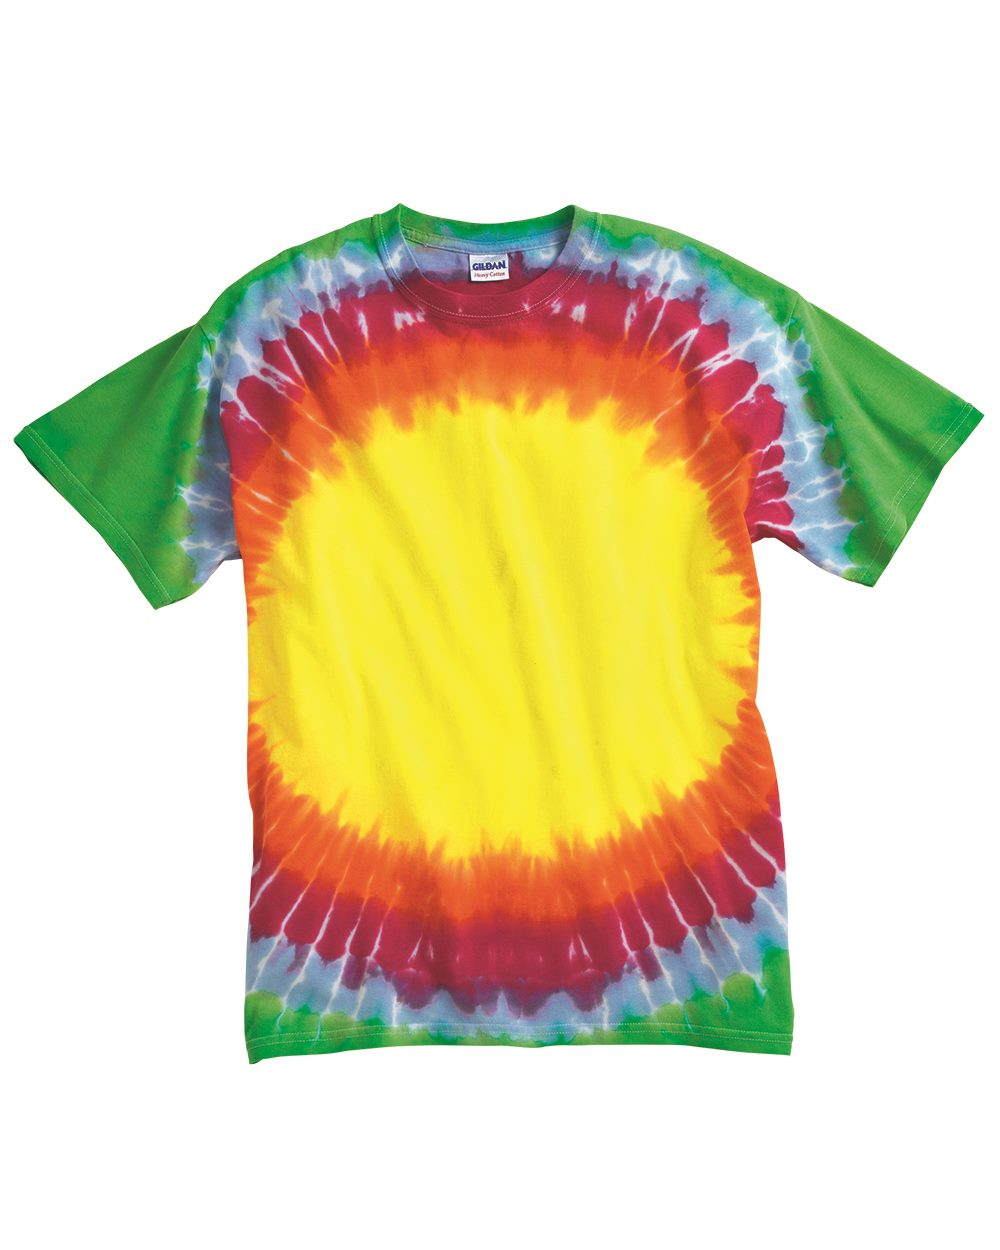 Tie-Dyed 200BE - Bullseye Tie Dye T Shirt